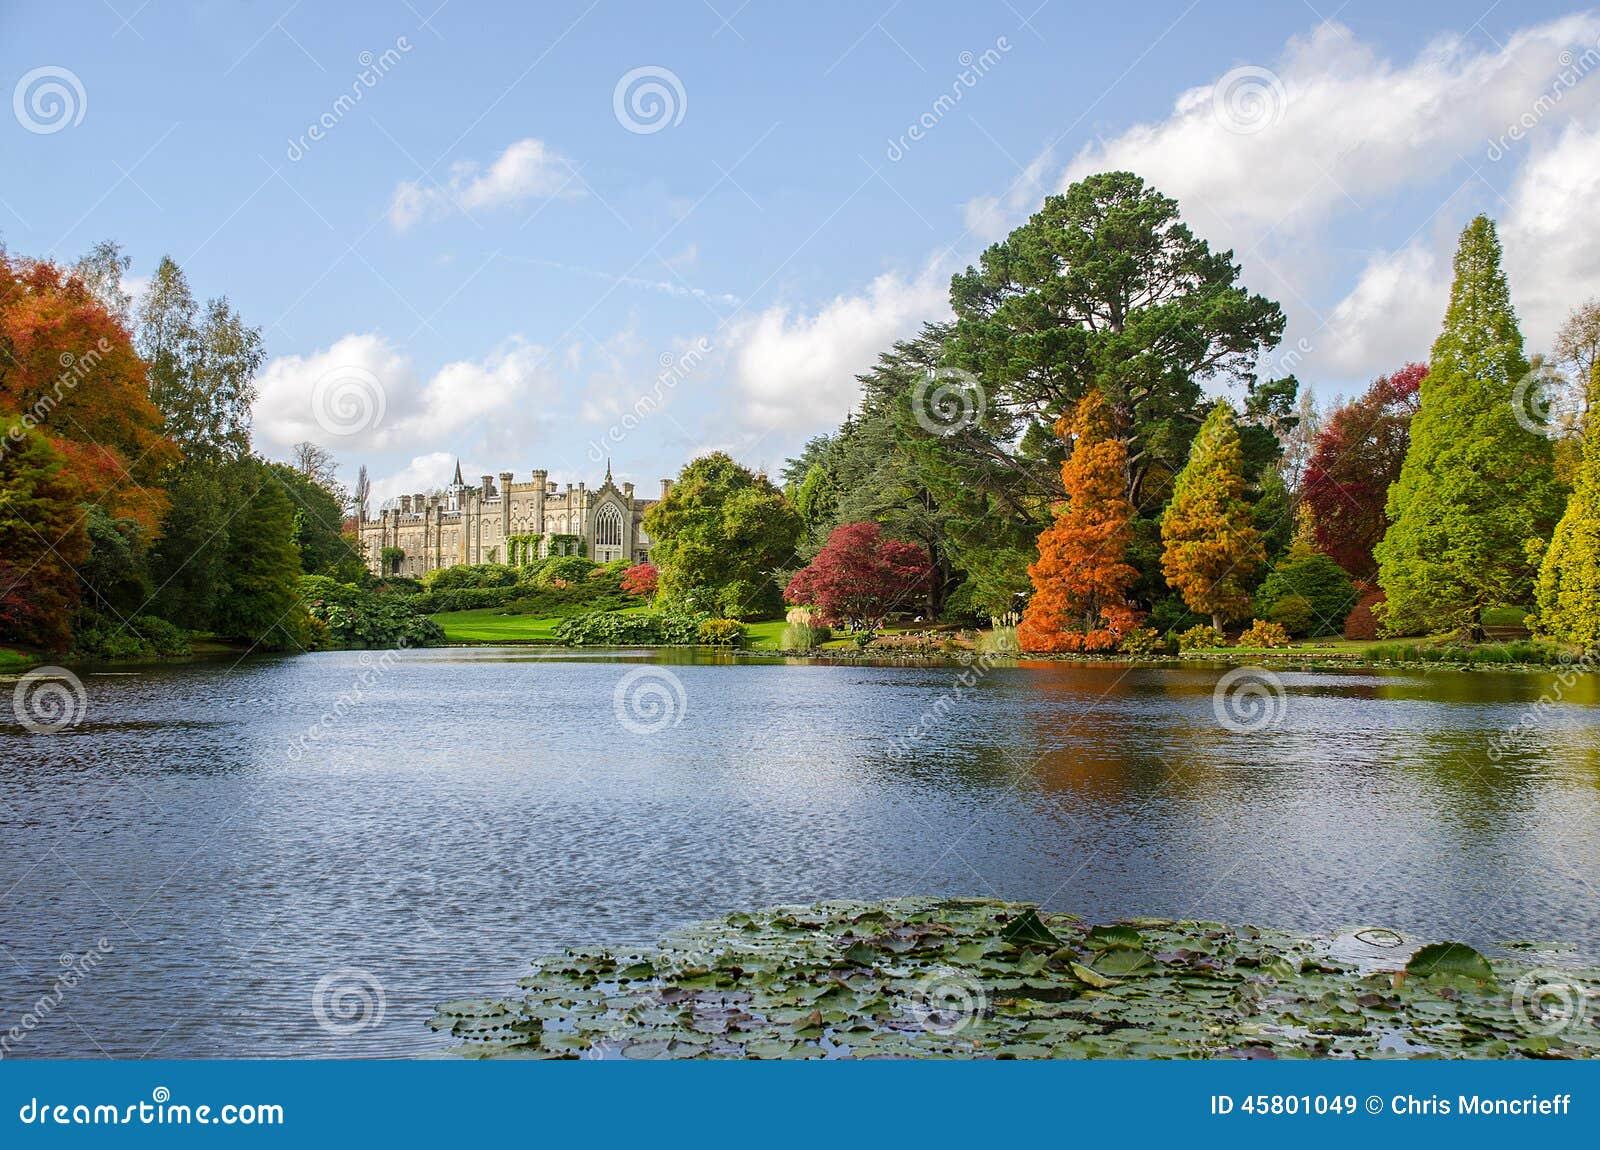 Sheffield Park Gardens Stock Photo - Image 45801049